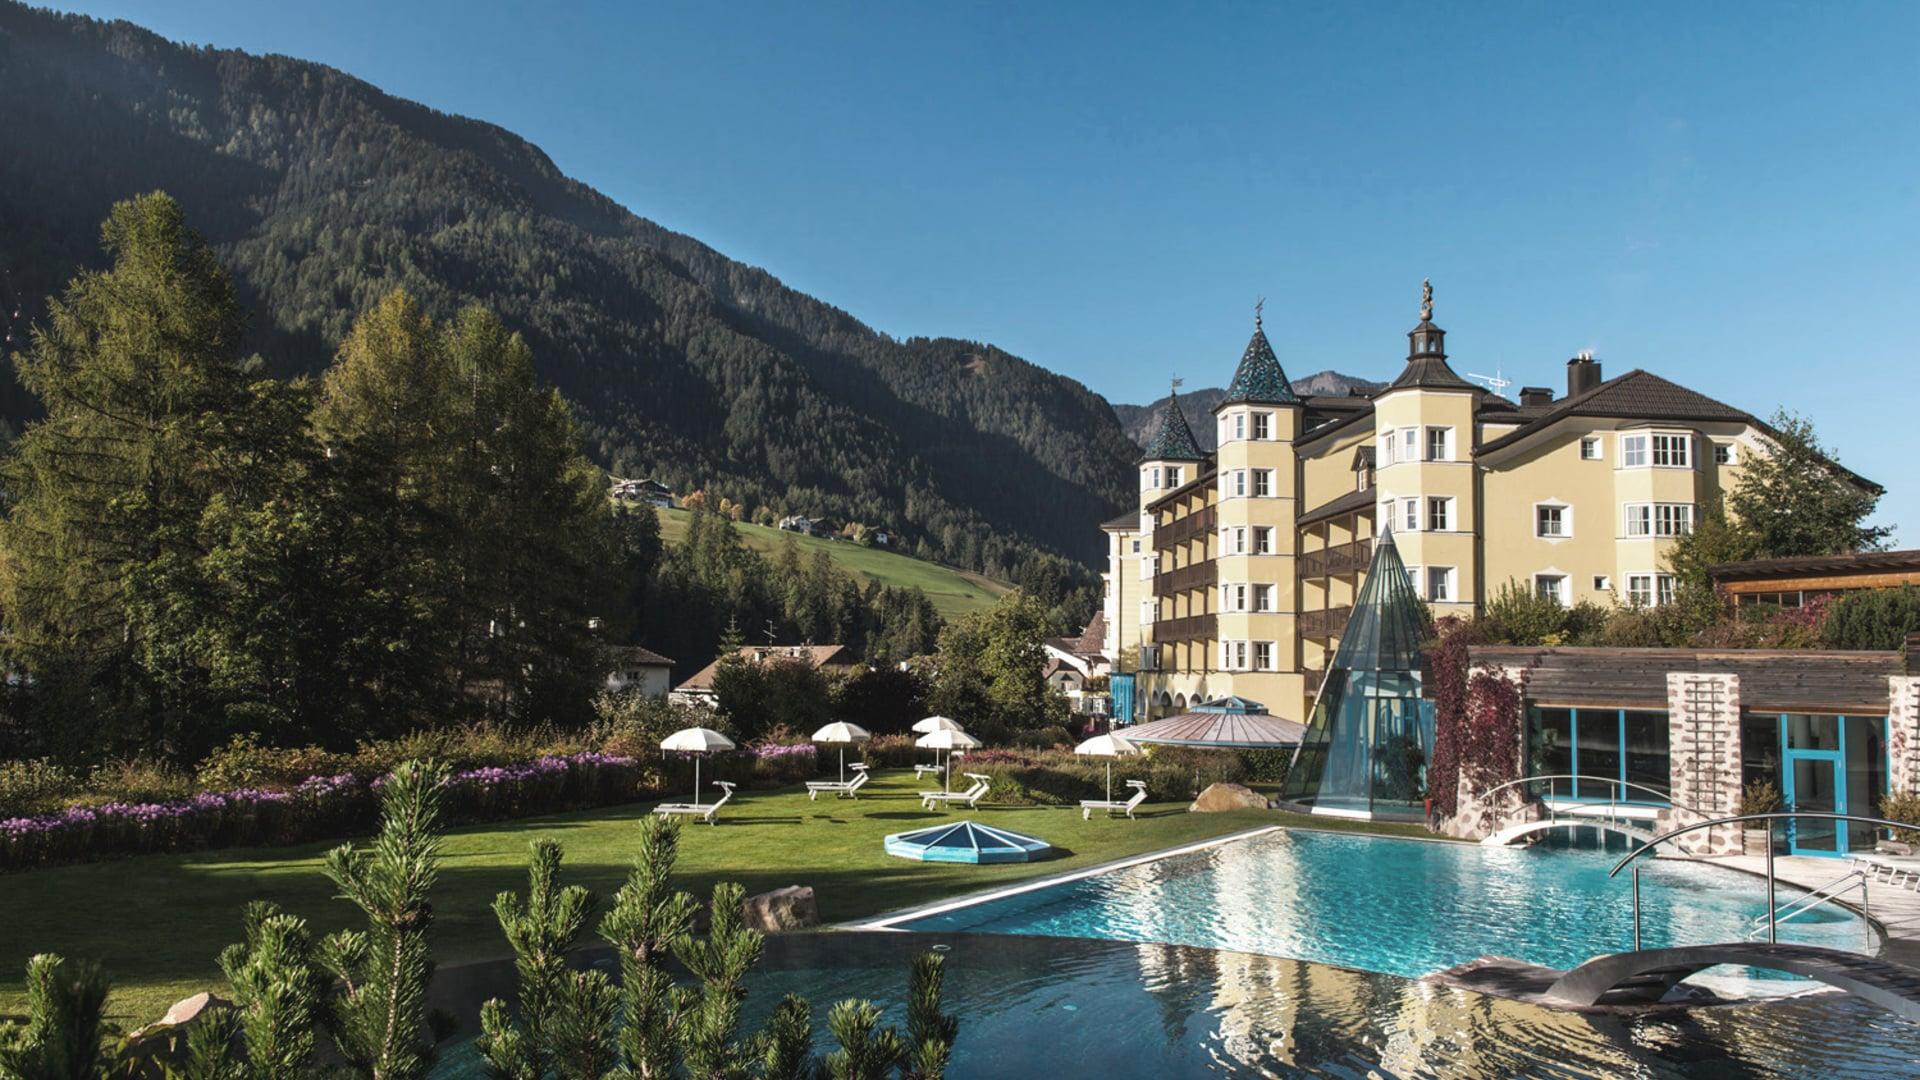 Toskana Sehenswrdigkeiten  ADLER Spa Resort THERMAE